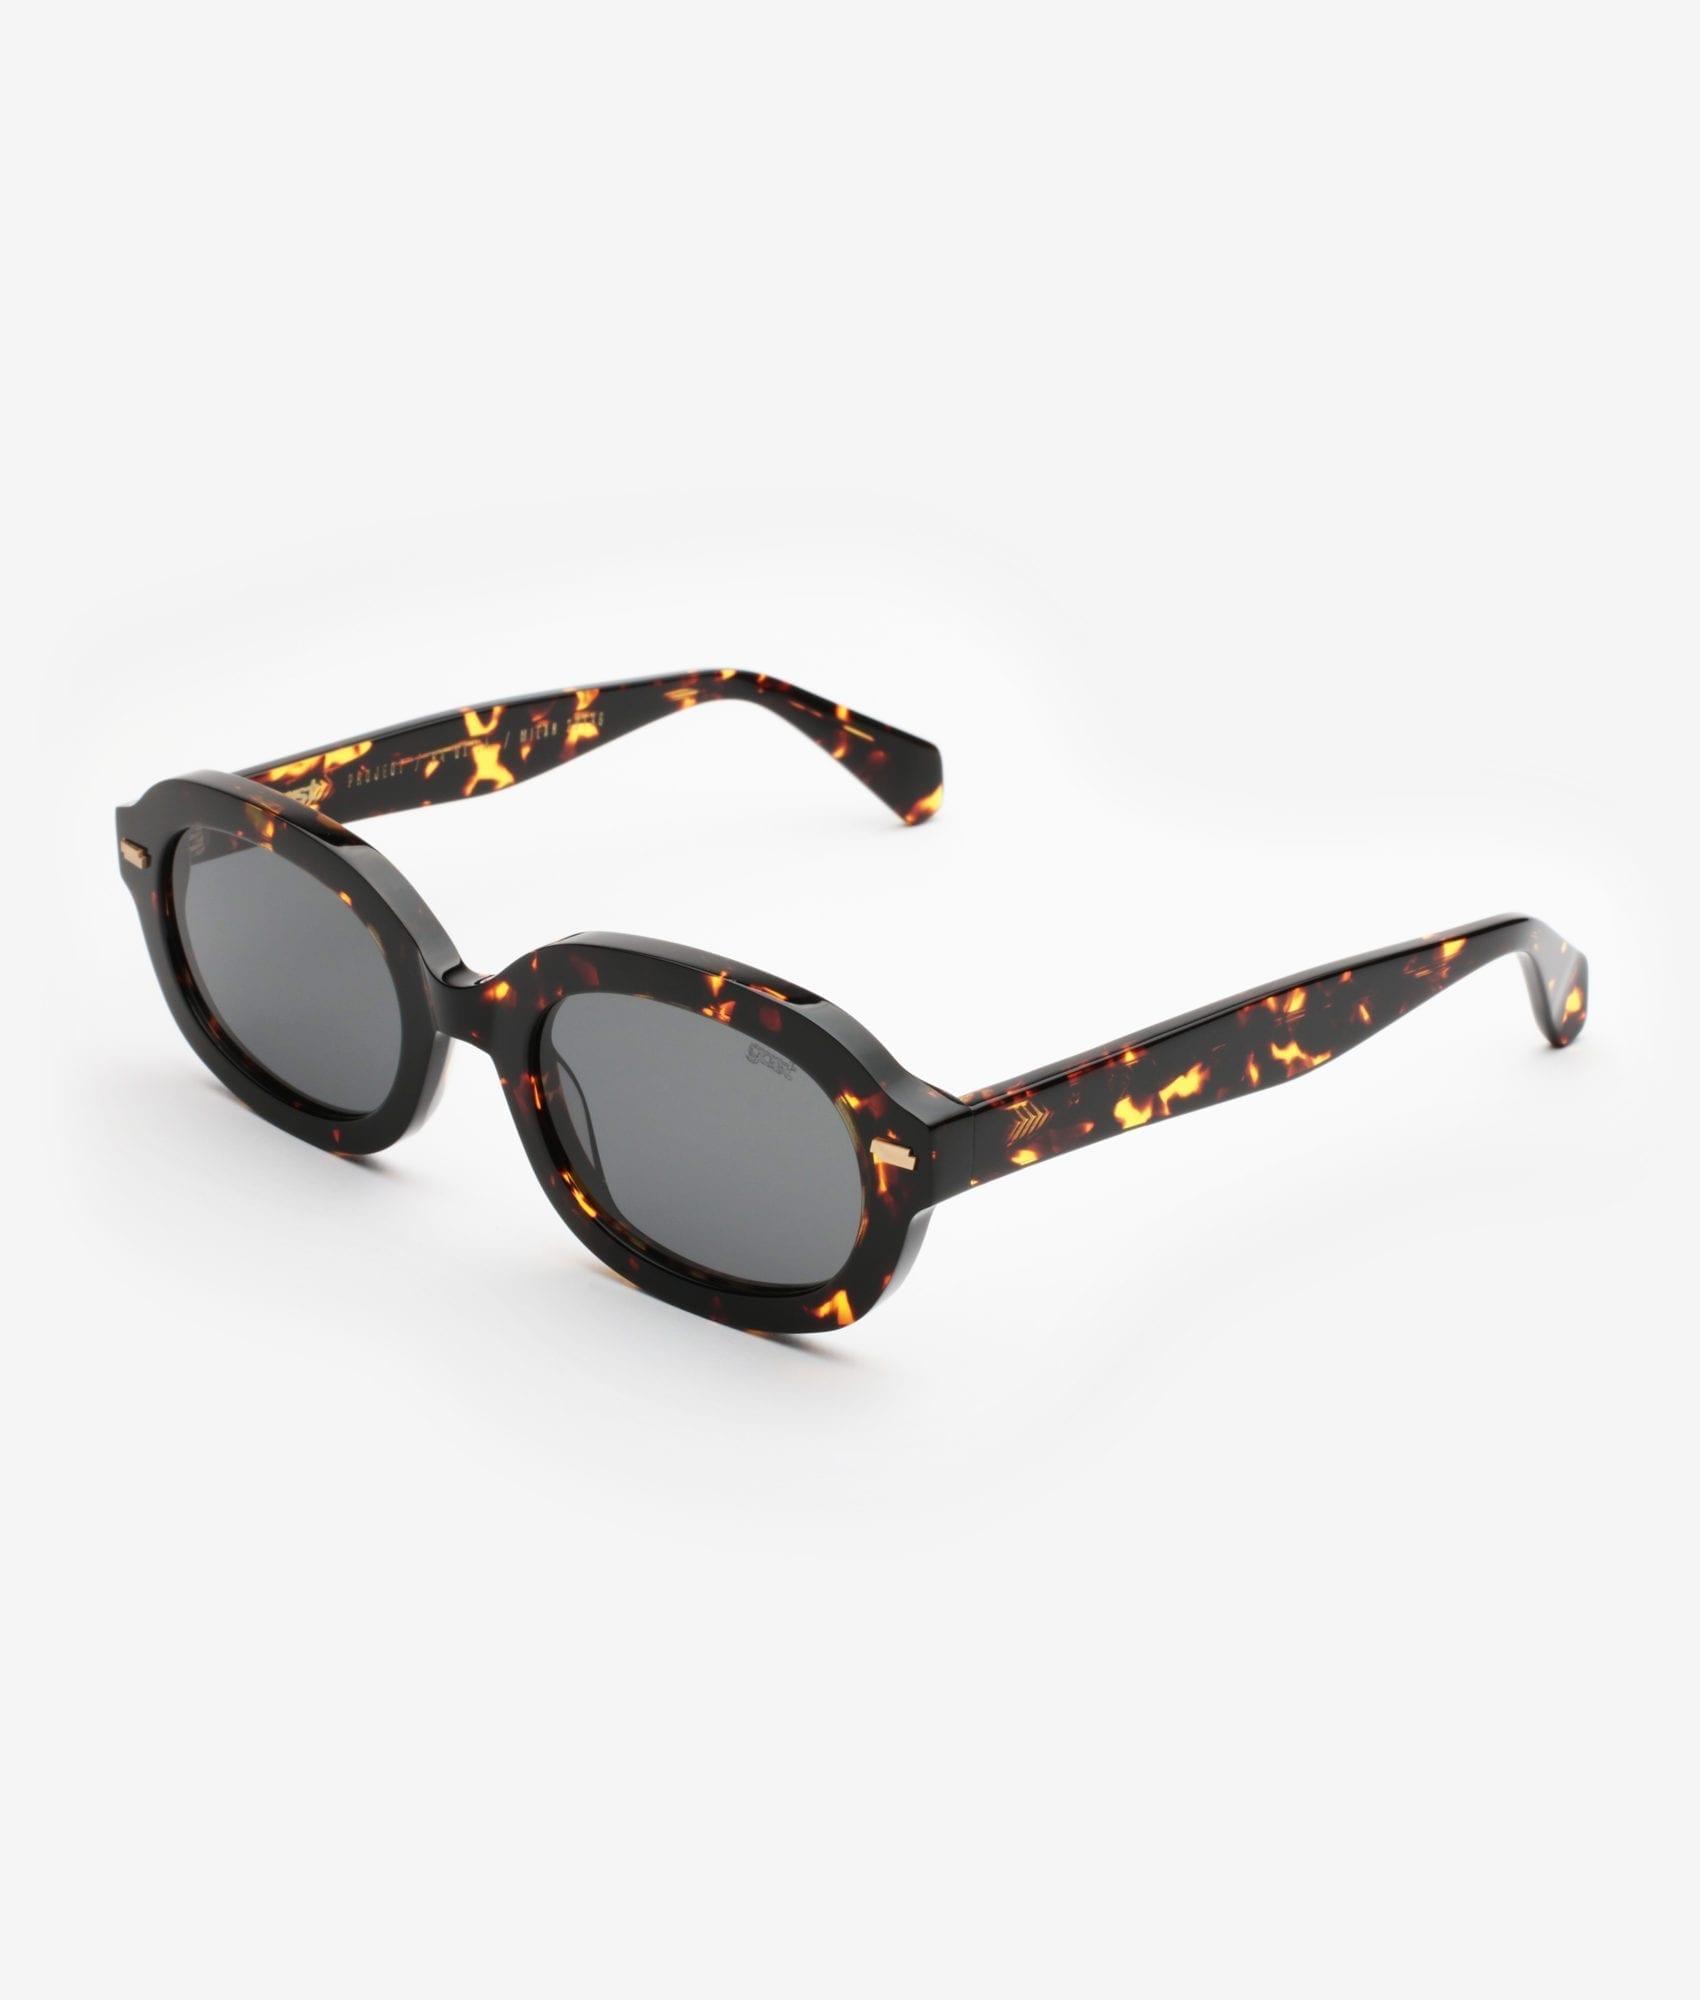 NSFK Havana Flame Gast Sunglasses